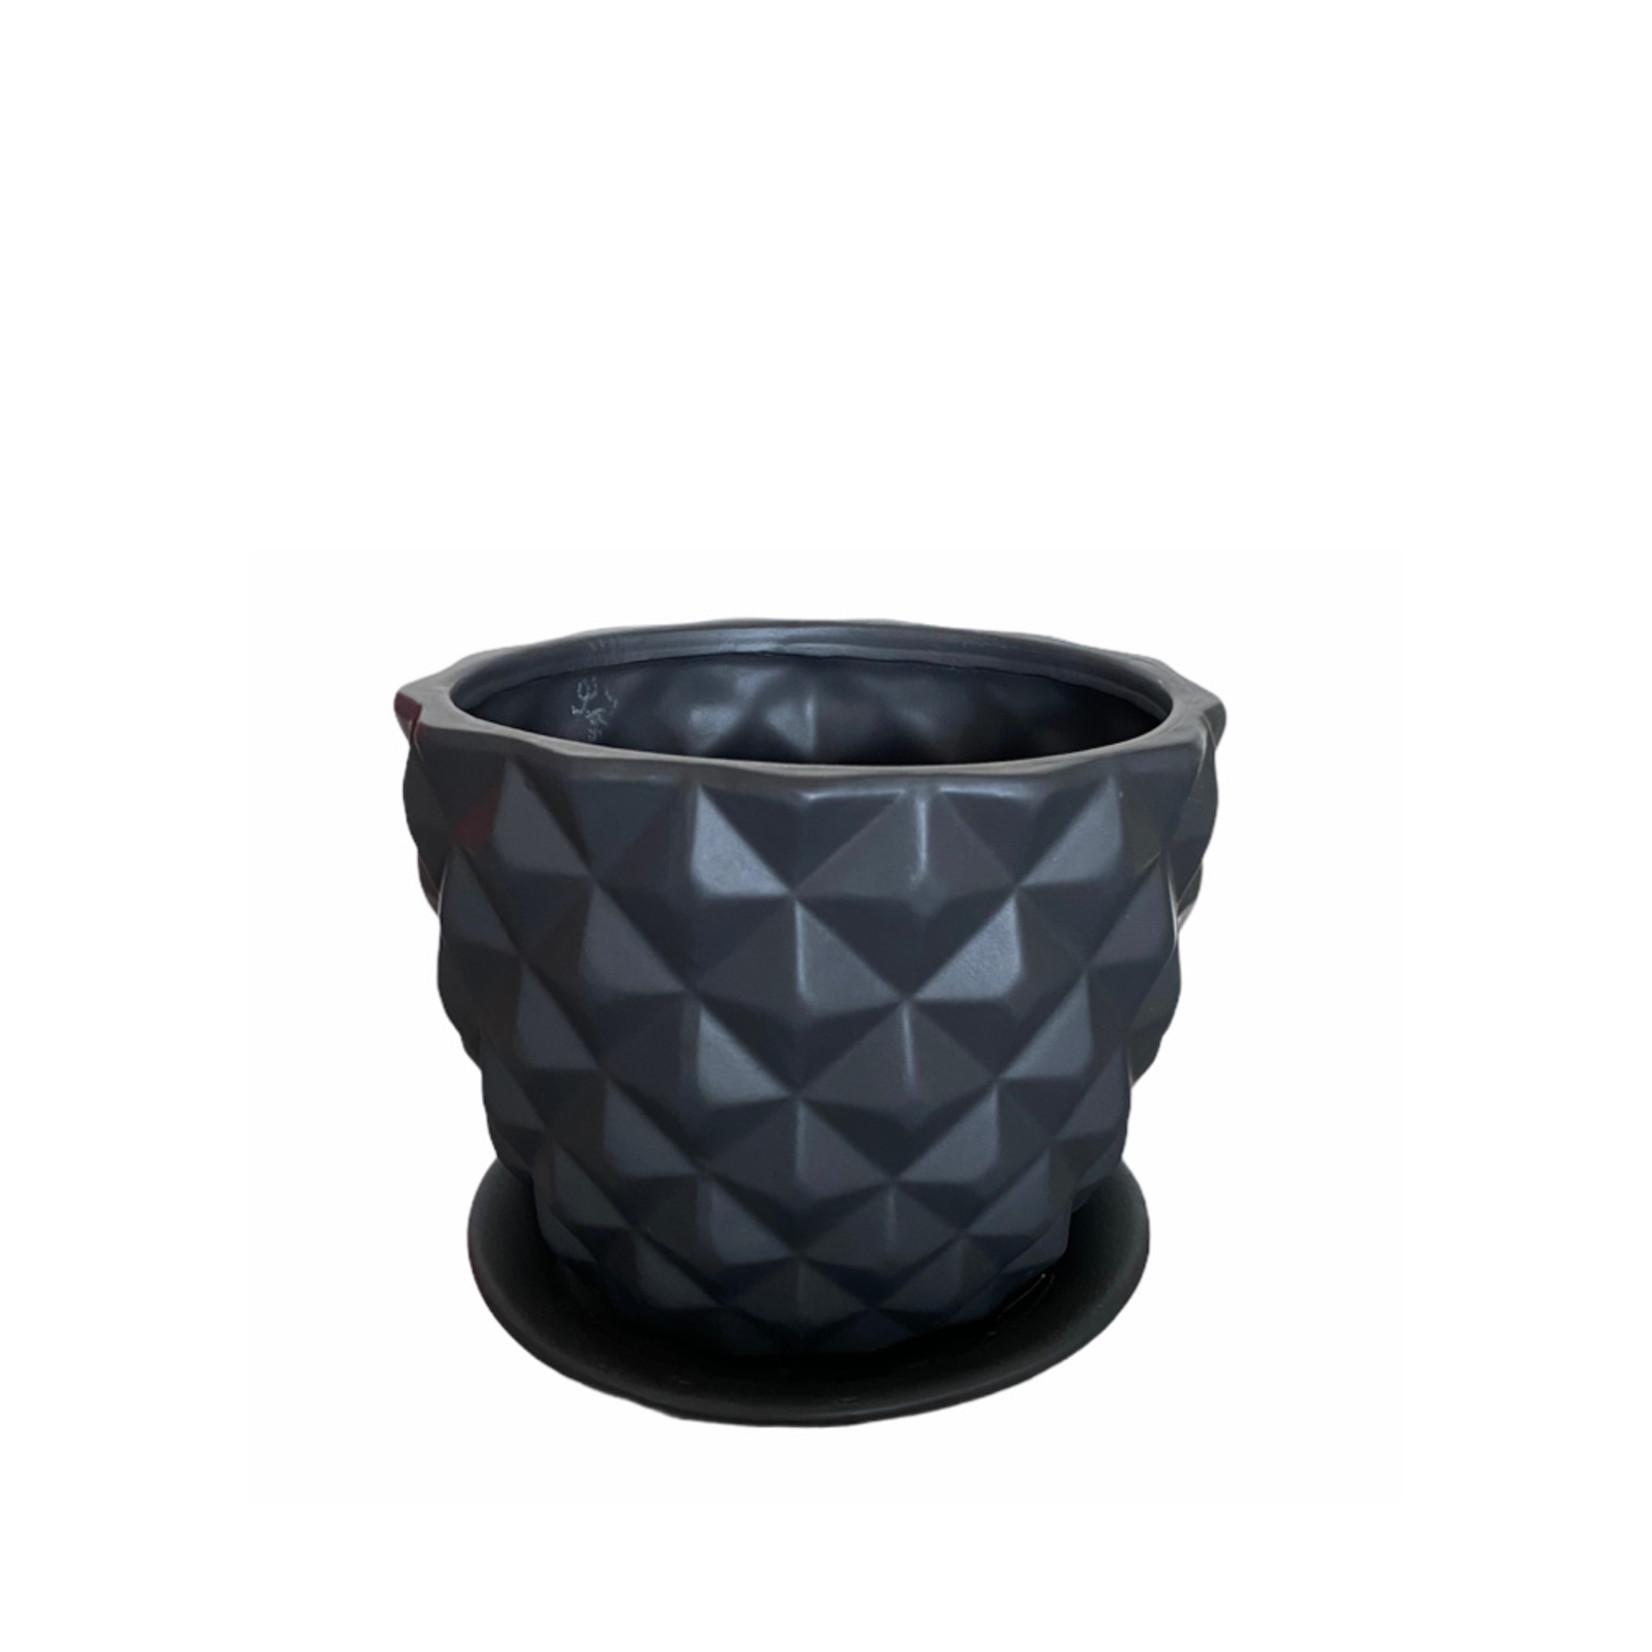 Gline Matte Black Ceramic Pixel with Saucer 18cm